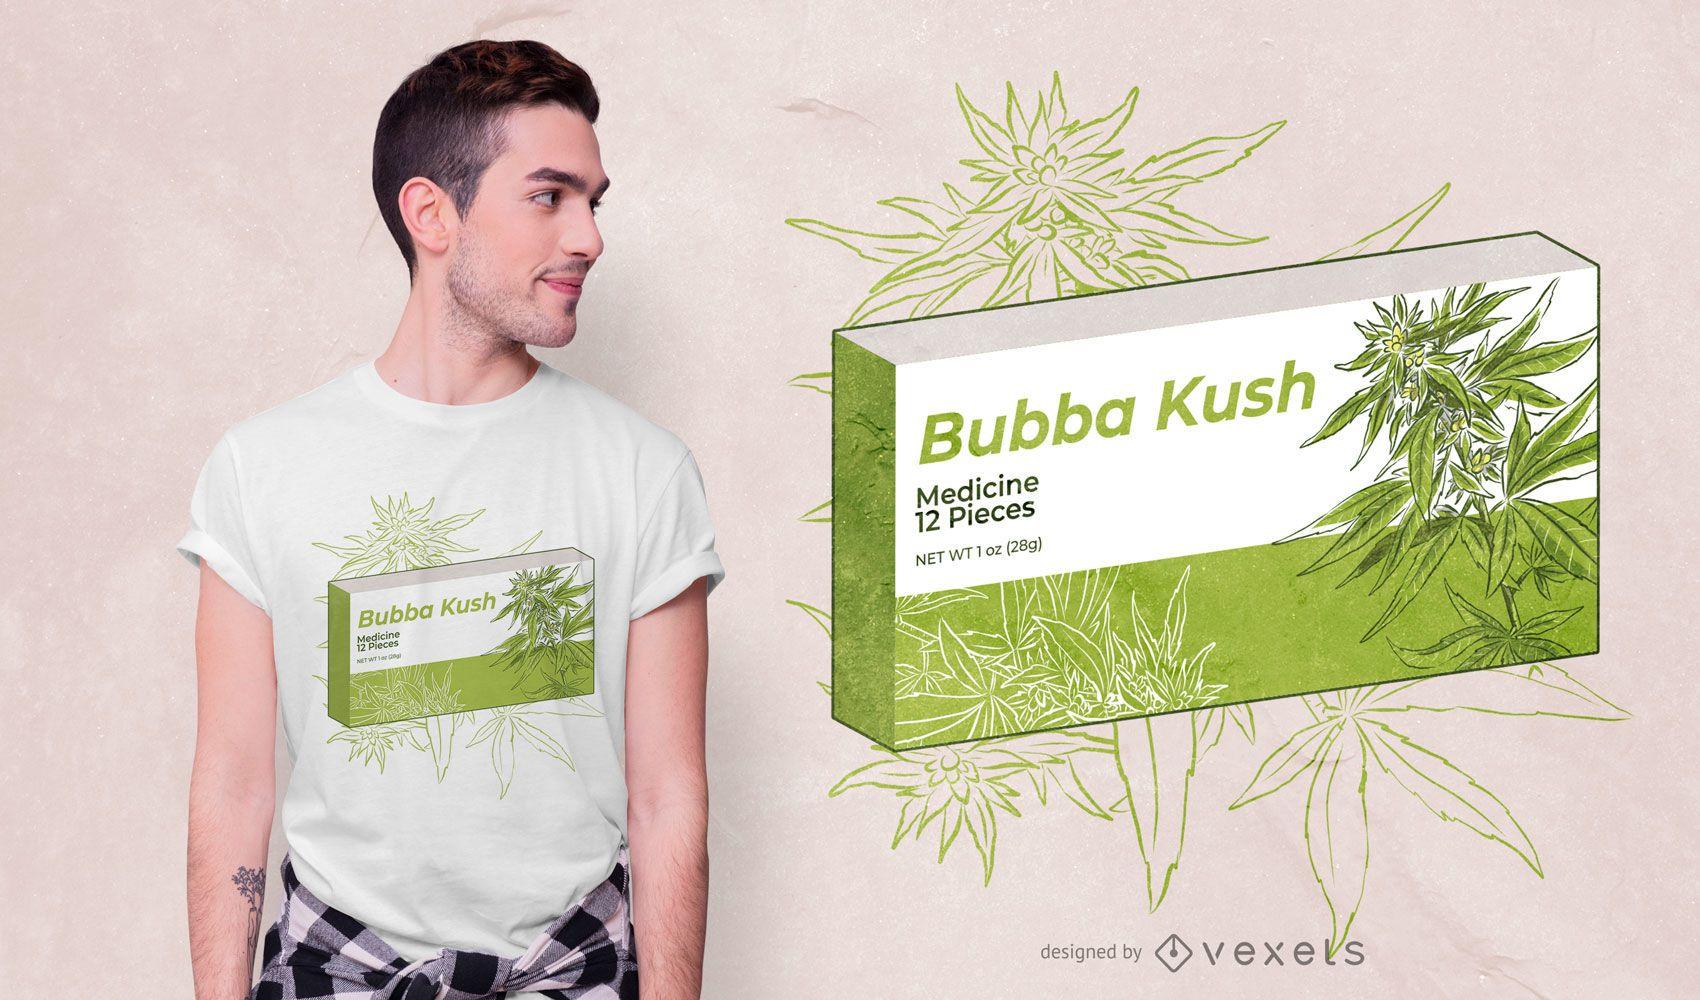 Bubba kush t-shirt design